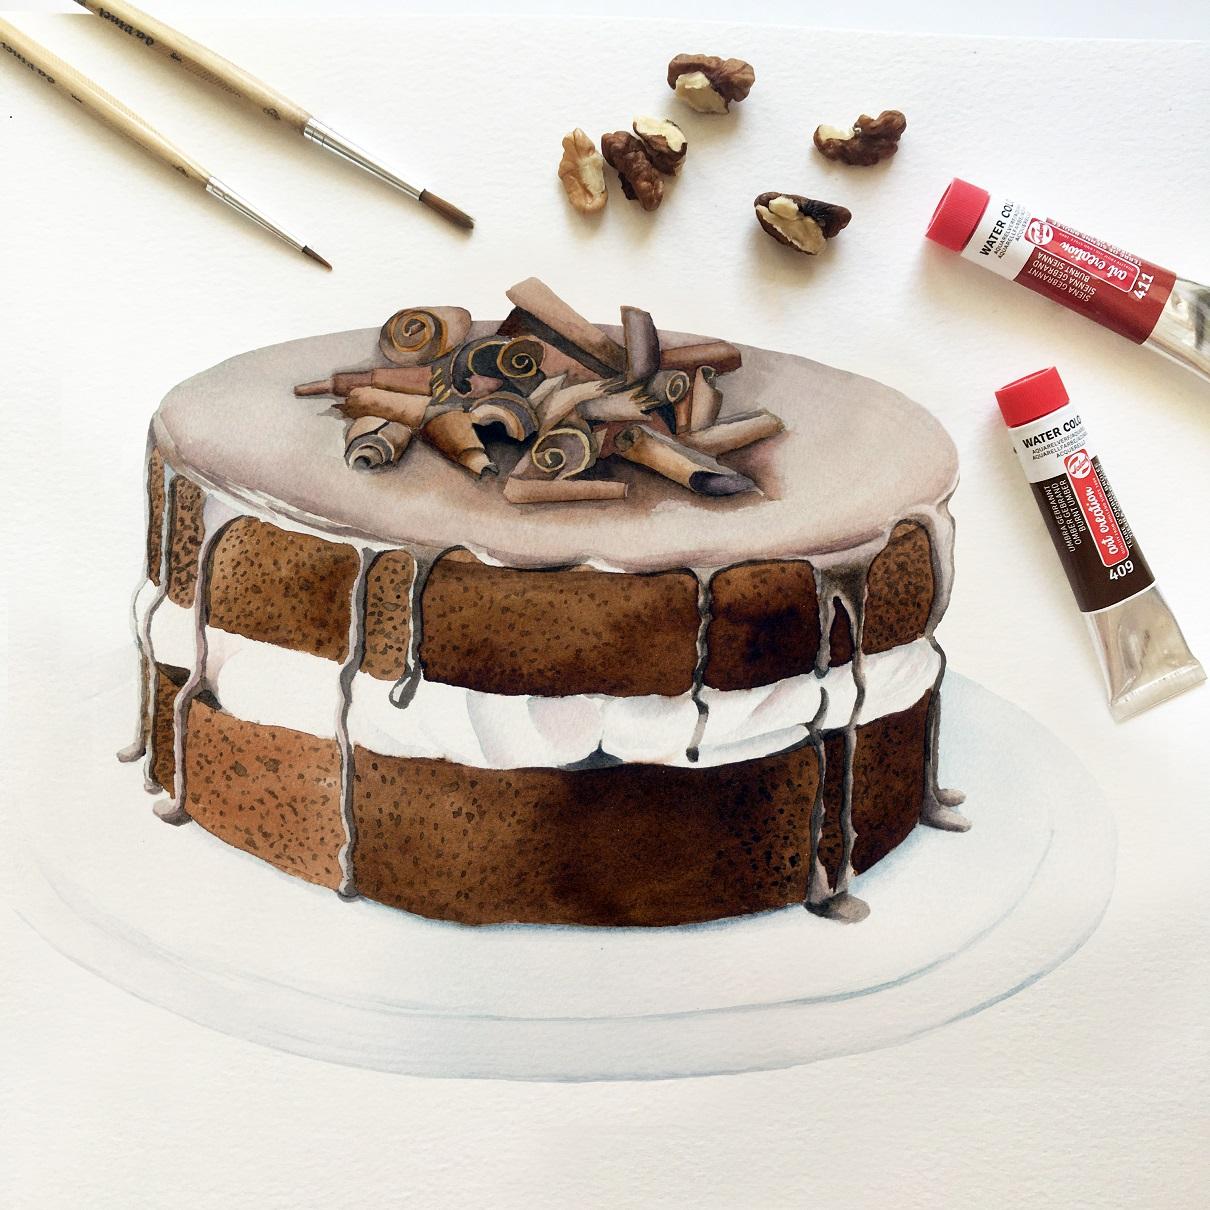 cake_food_project_chocolate_cake.jpg